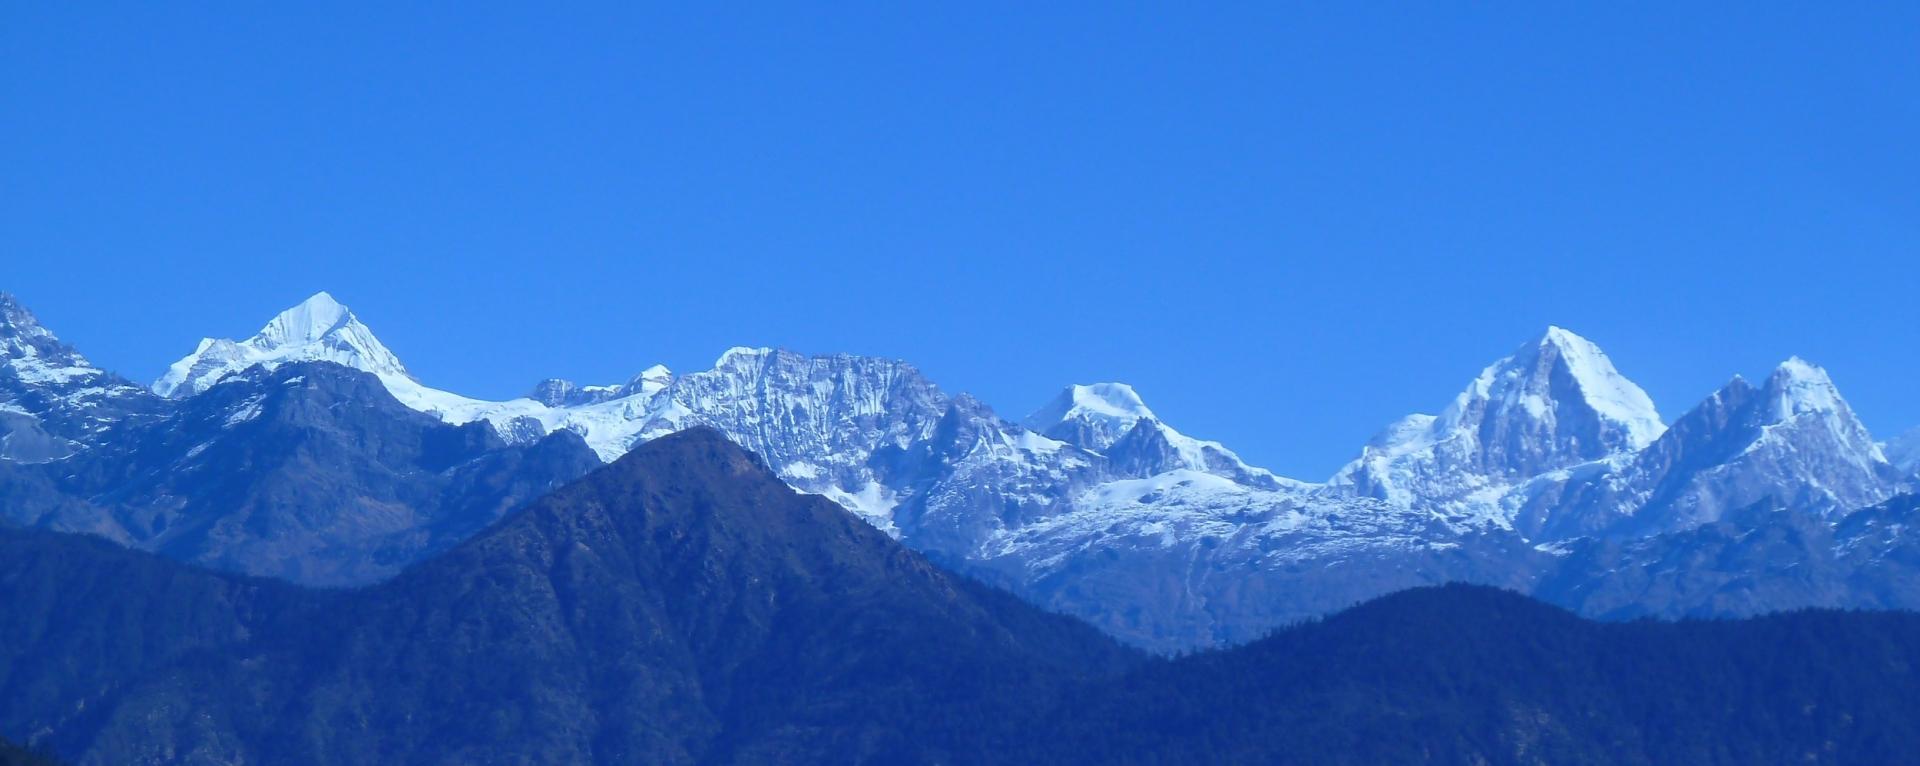 Langtang mountain ranges view from Helambu.